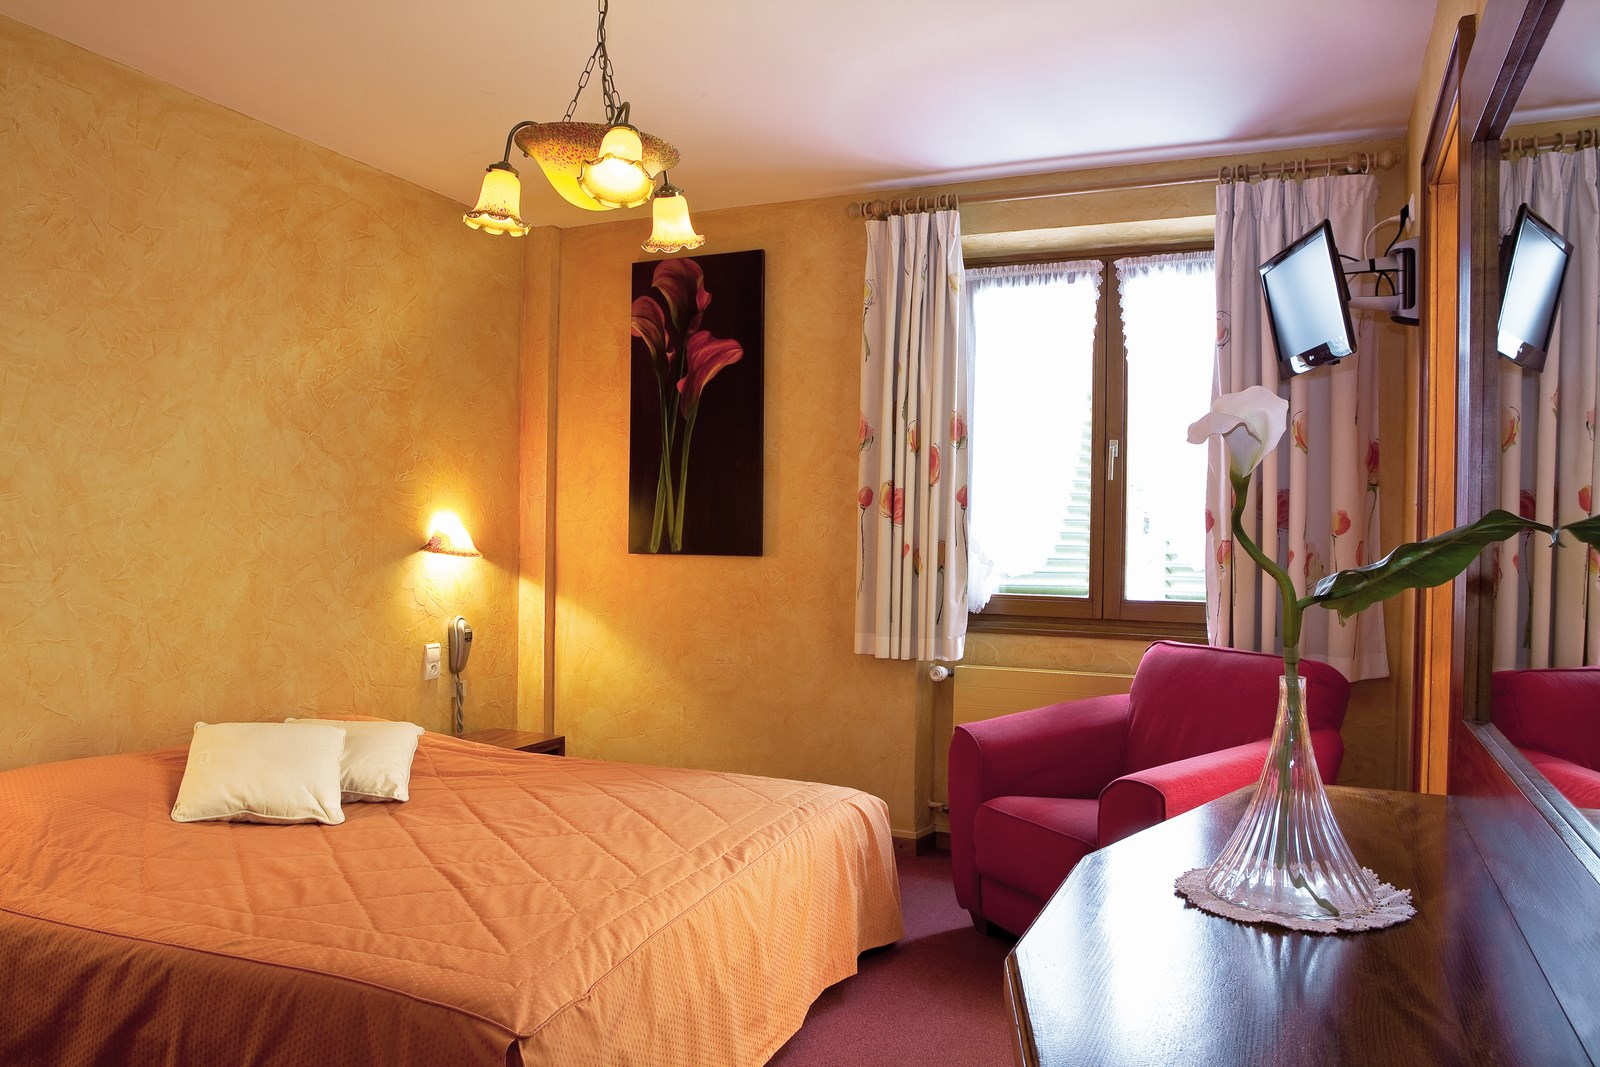 H tel a la vignette saint hippolyte 68590 recherche for Recherche hotel